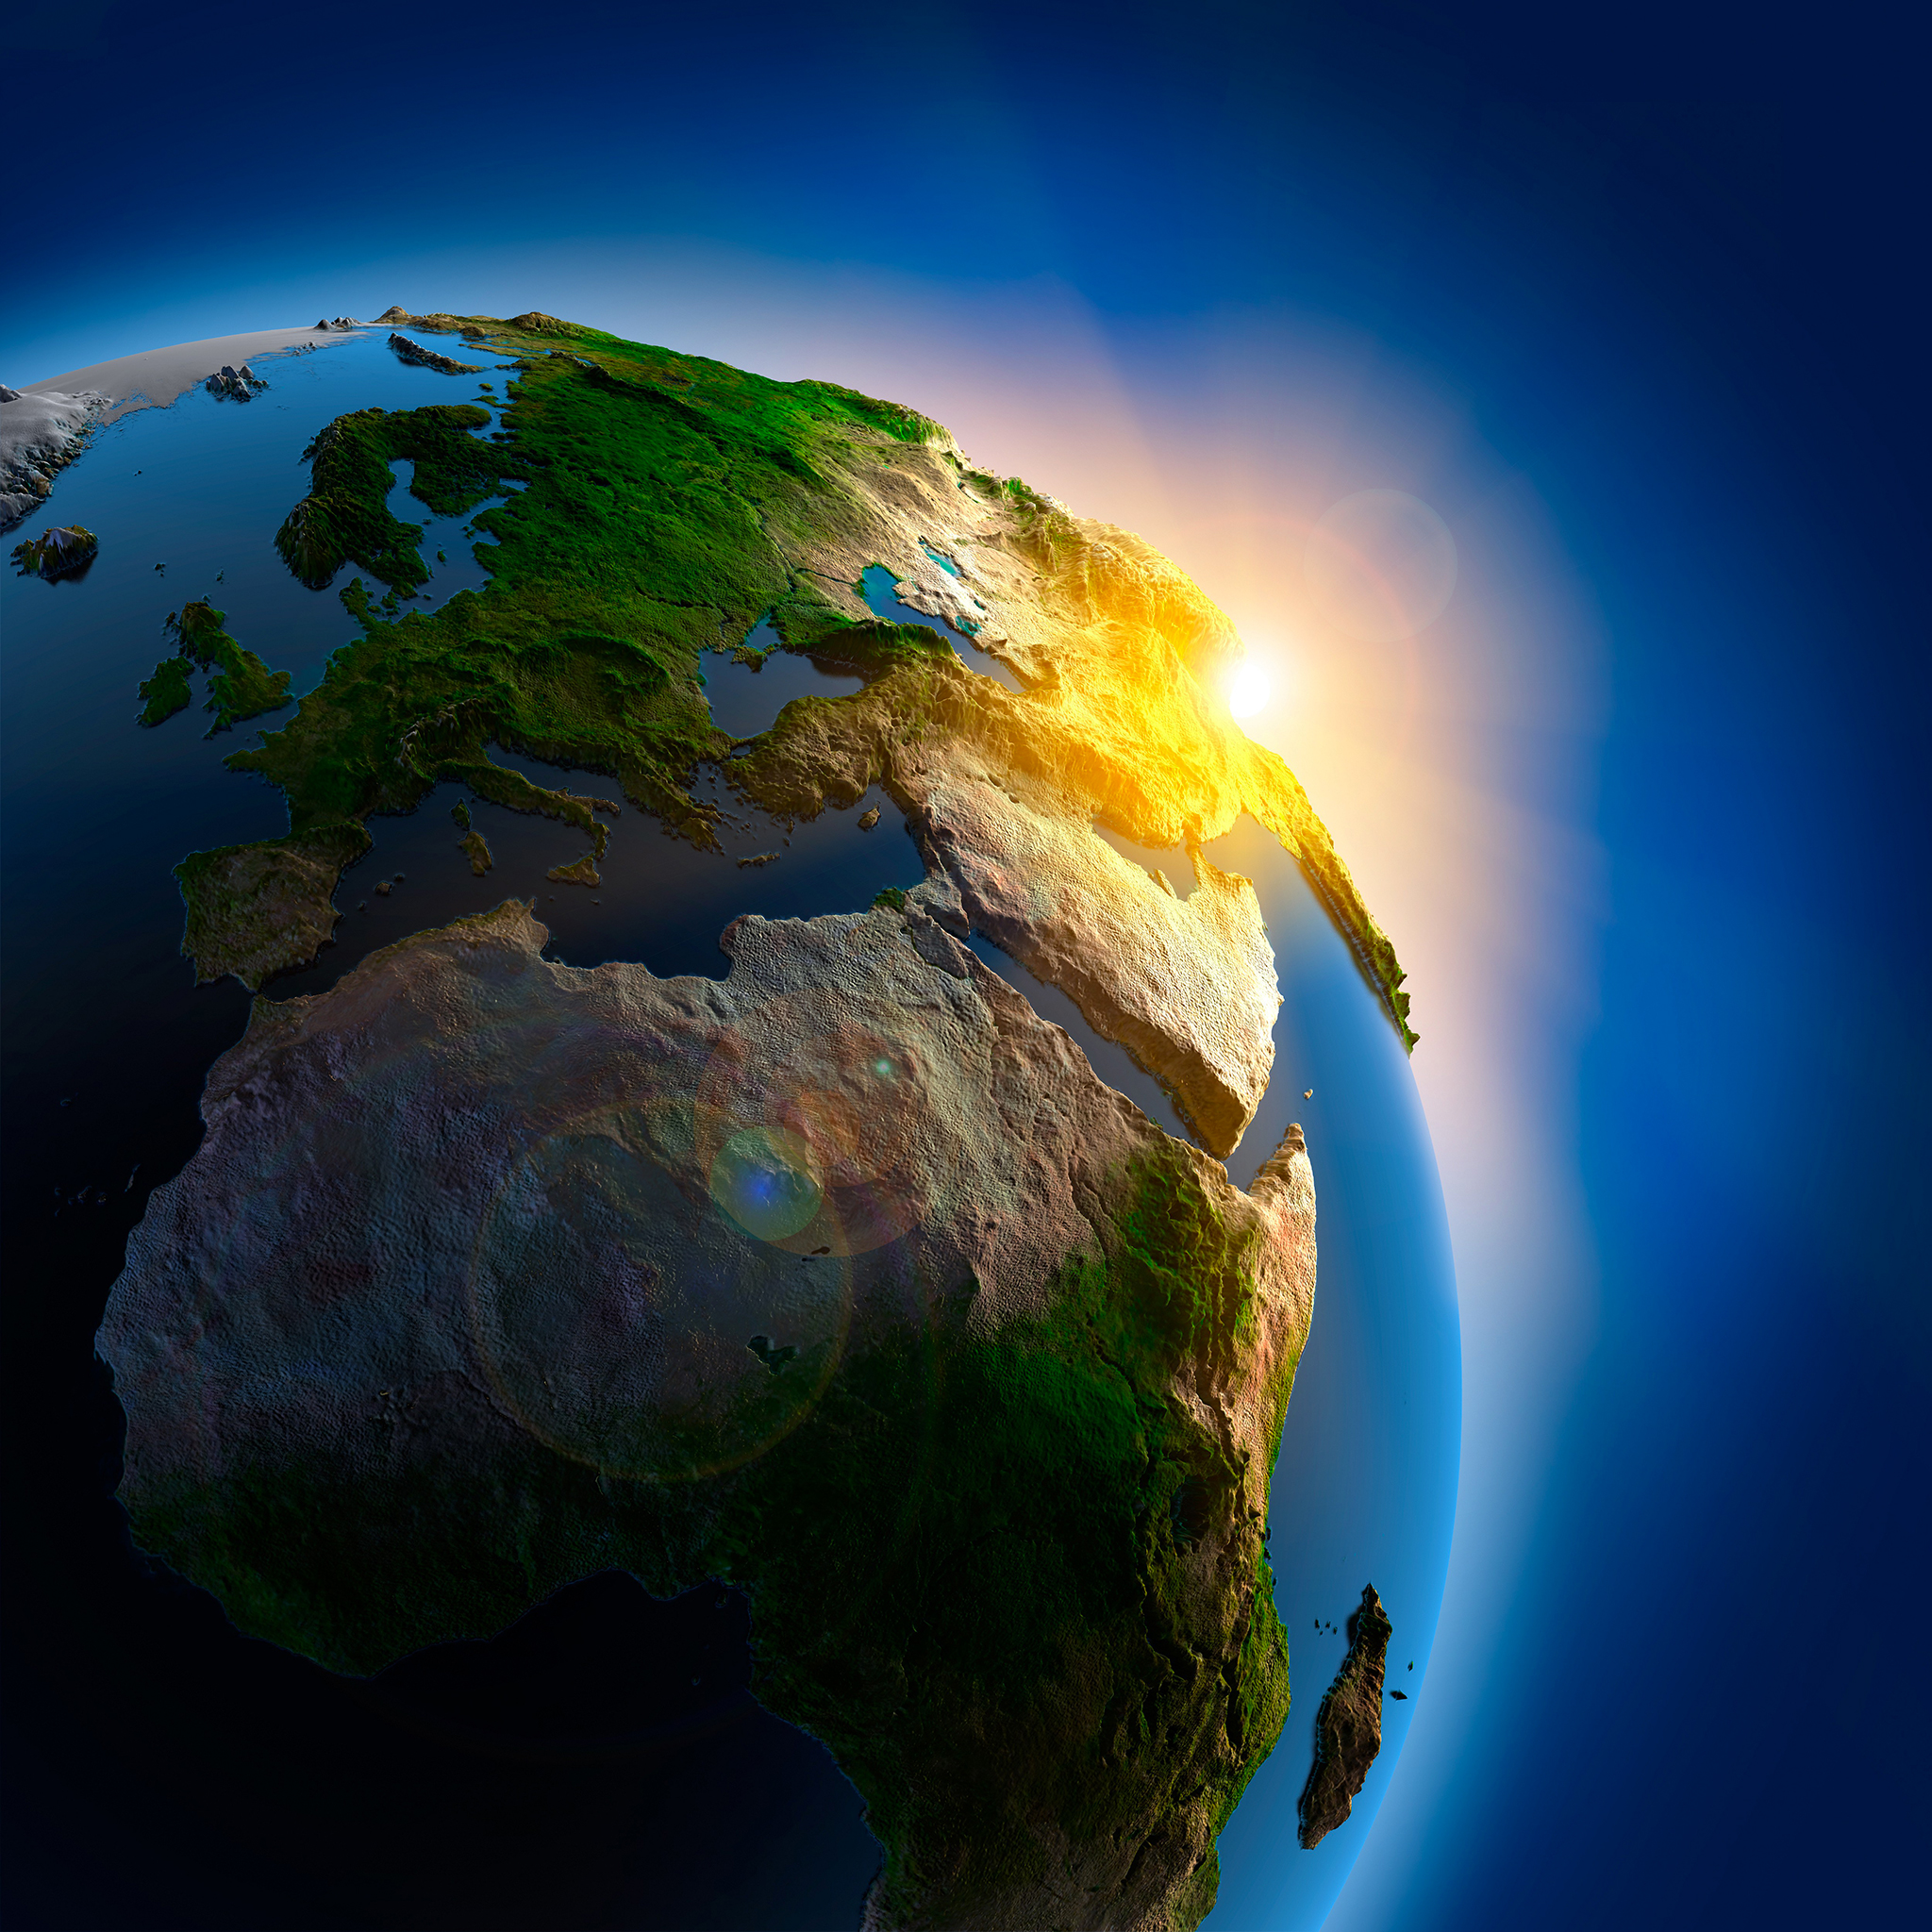 Planet Earth Light 3Wallpapers iPad Retina Planet Earth Light   iPad Retina